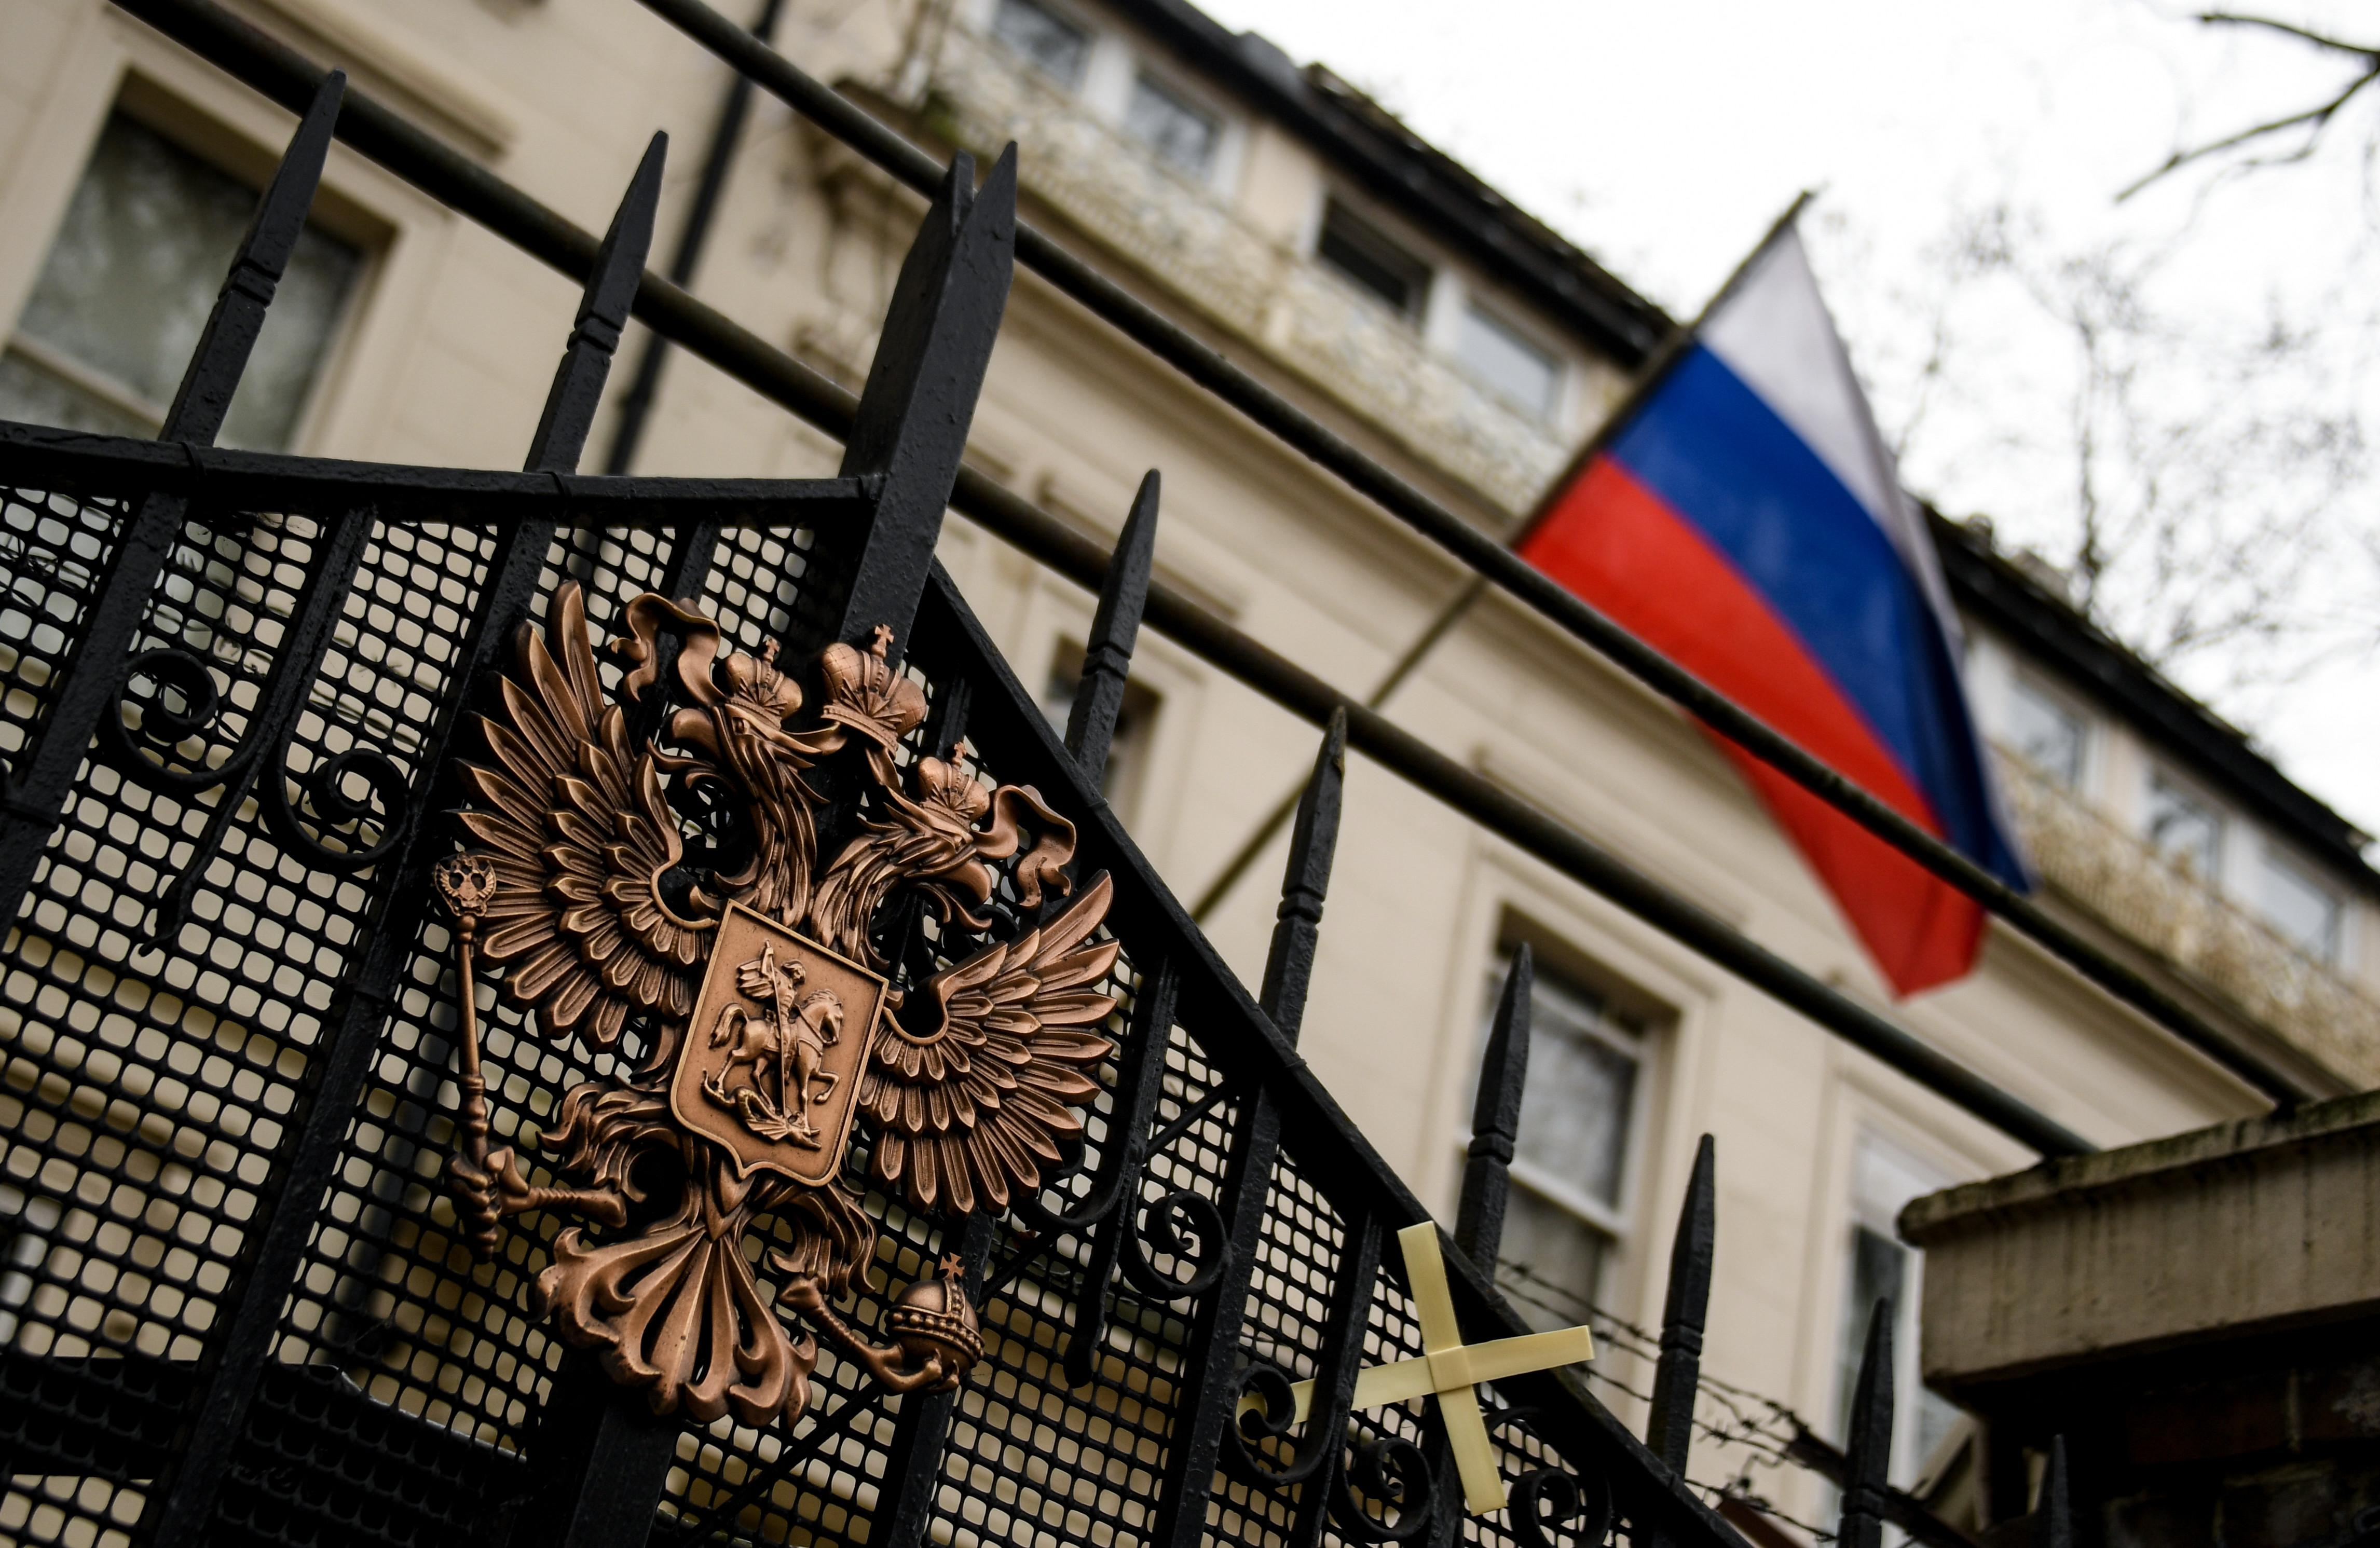 <p>Фото: &copy; РИА Новости / Алексей Филиппов</p>